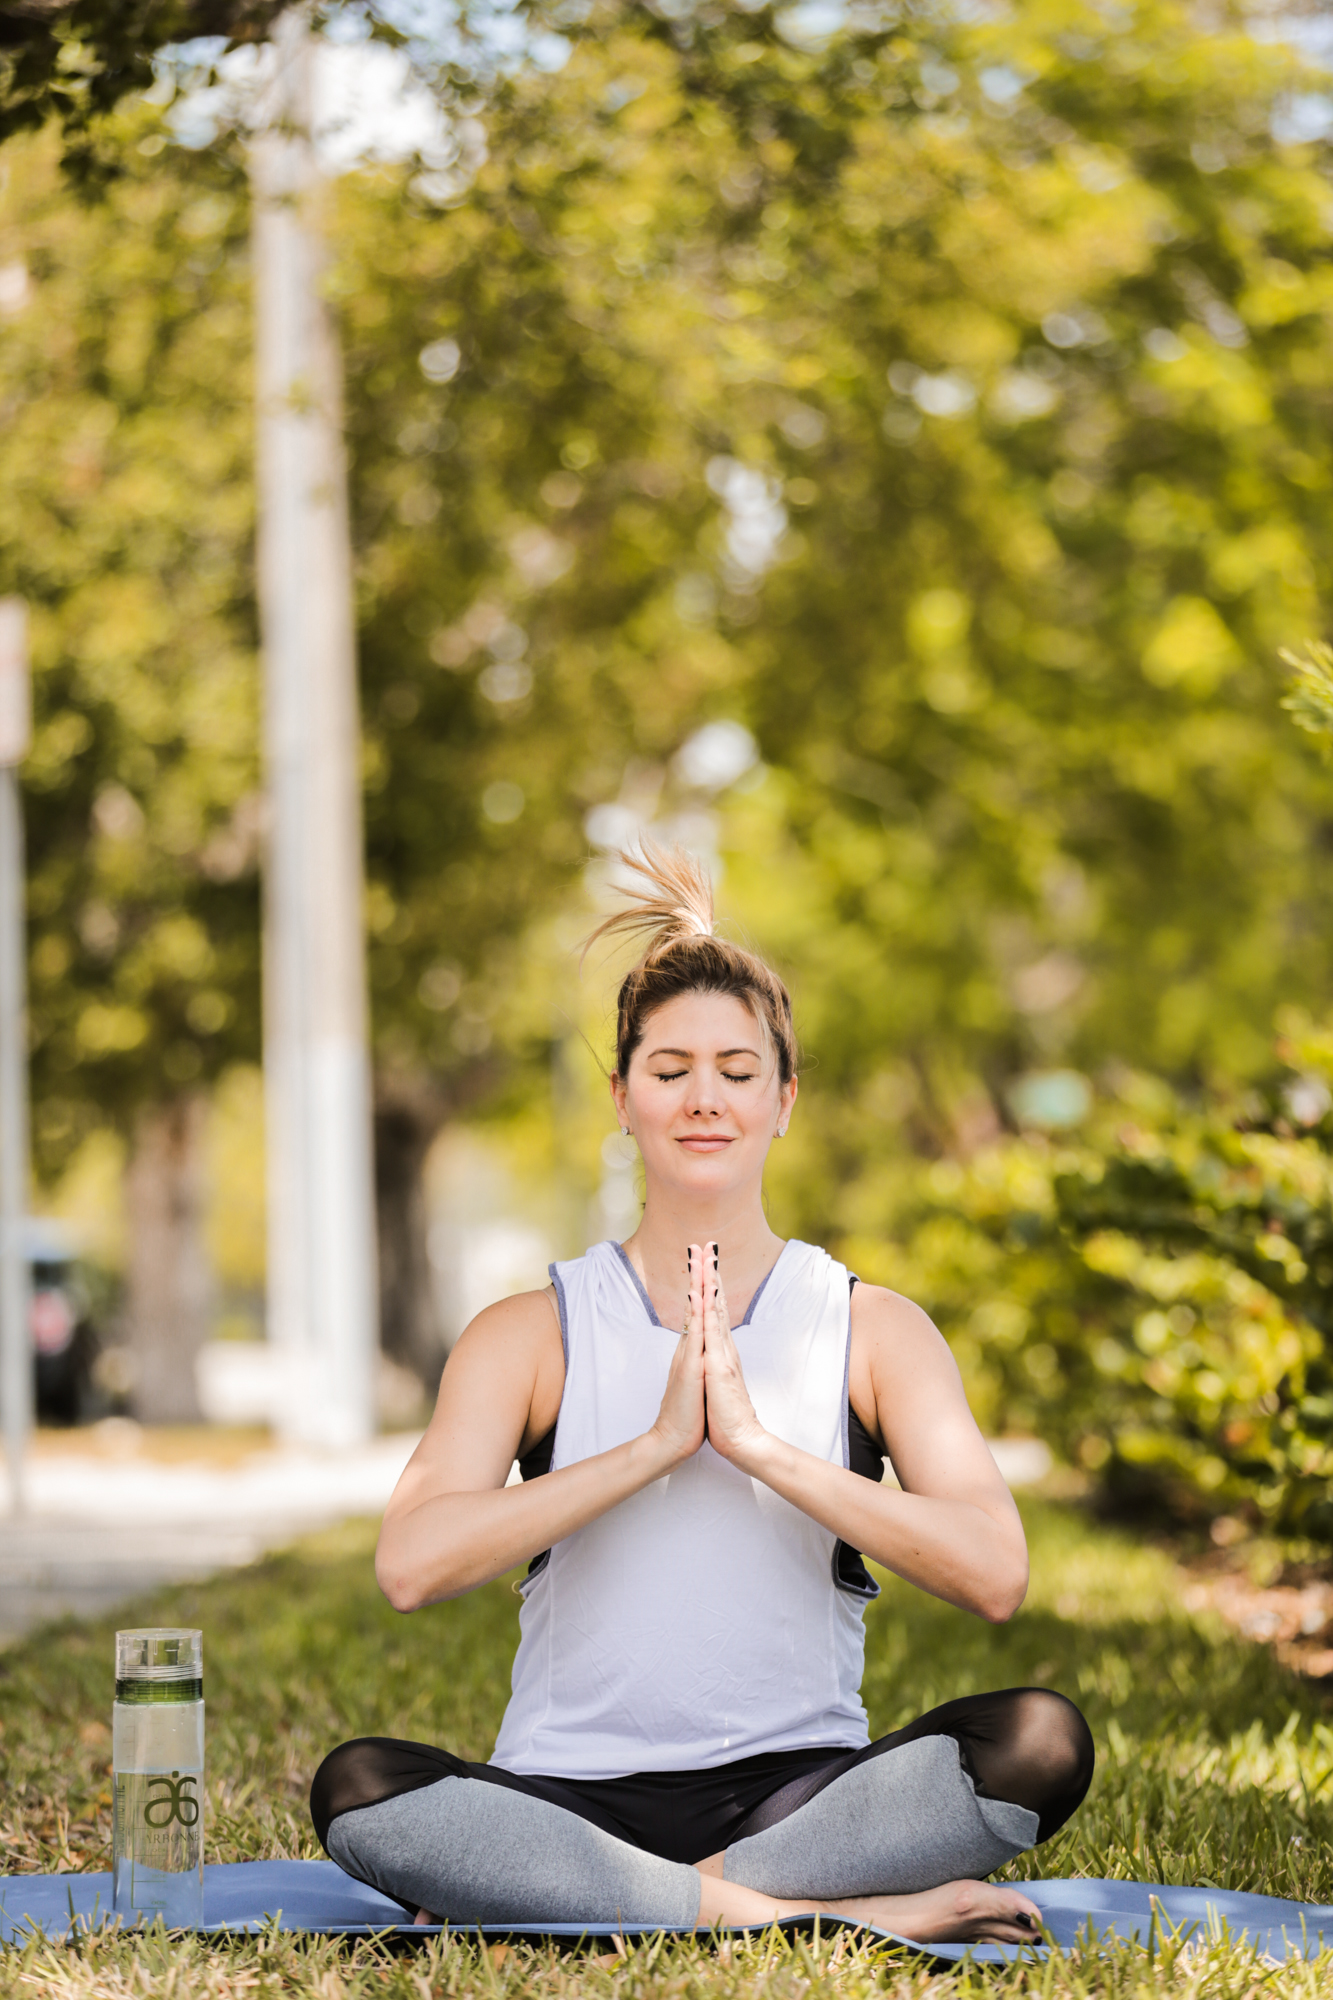 el-yoga-es-vida